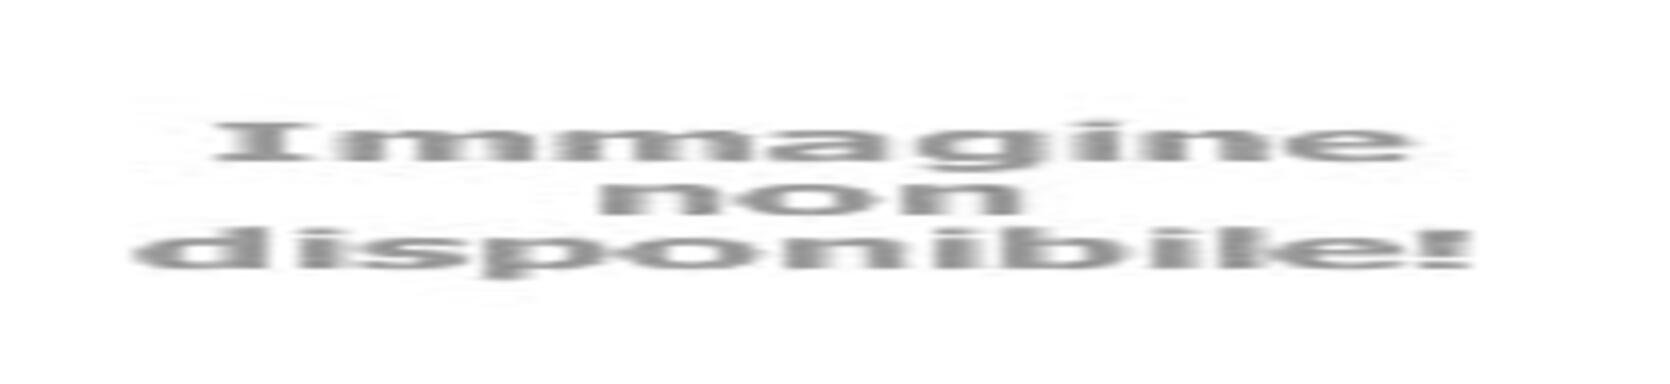 basketriminicrabs it 6-2716-video-eybl-u20-i-tappa-szczecin-crabs 003